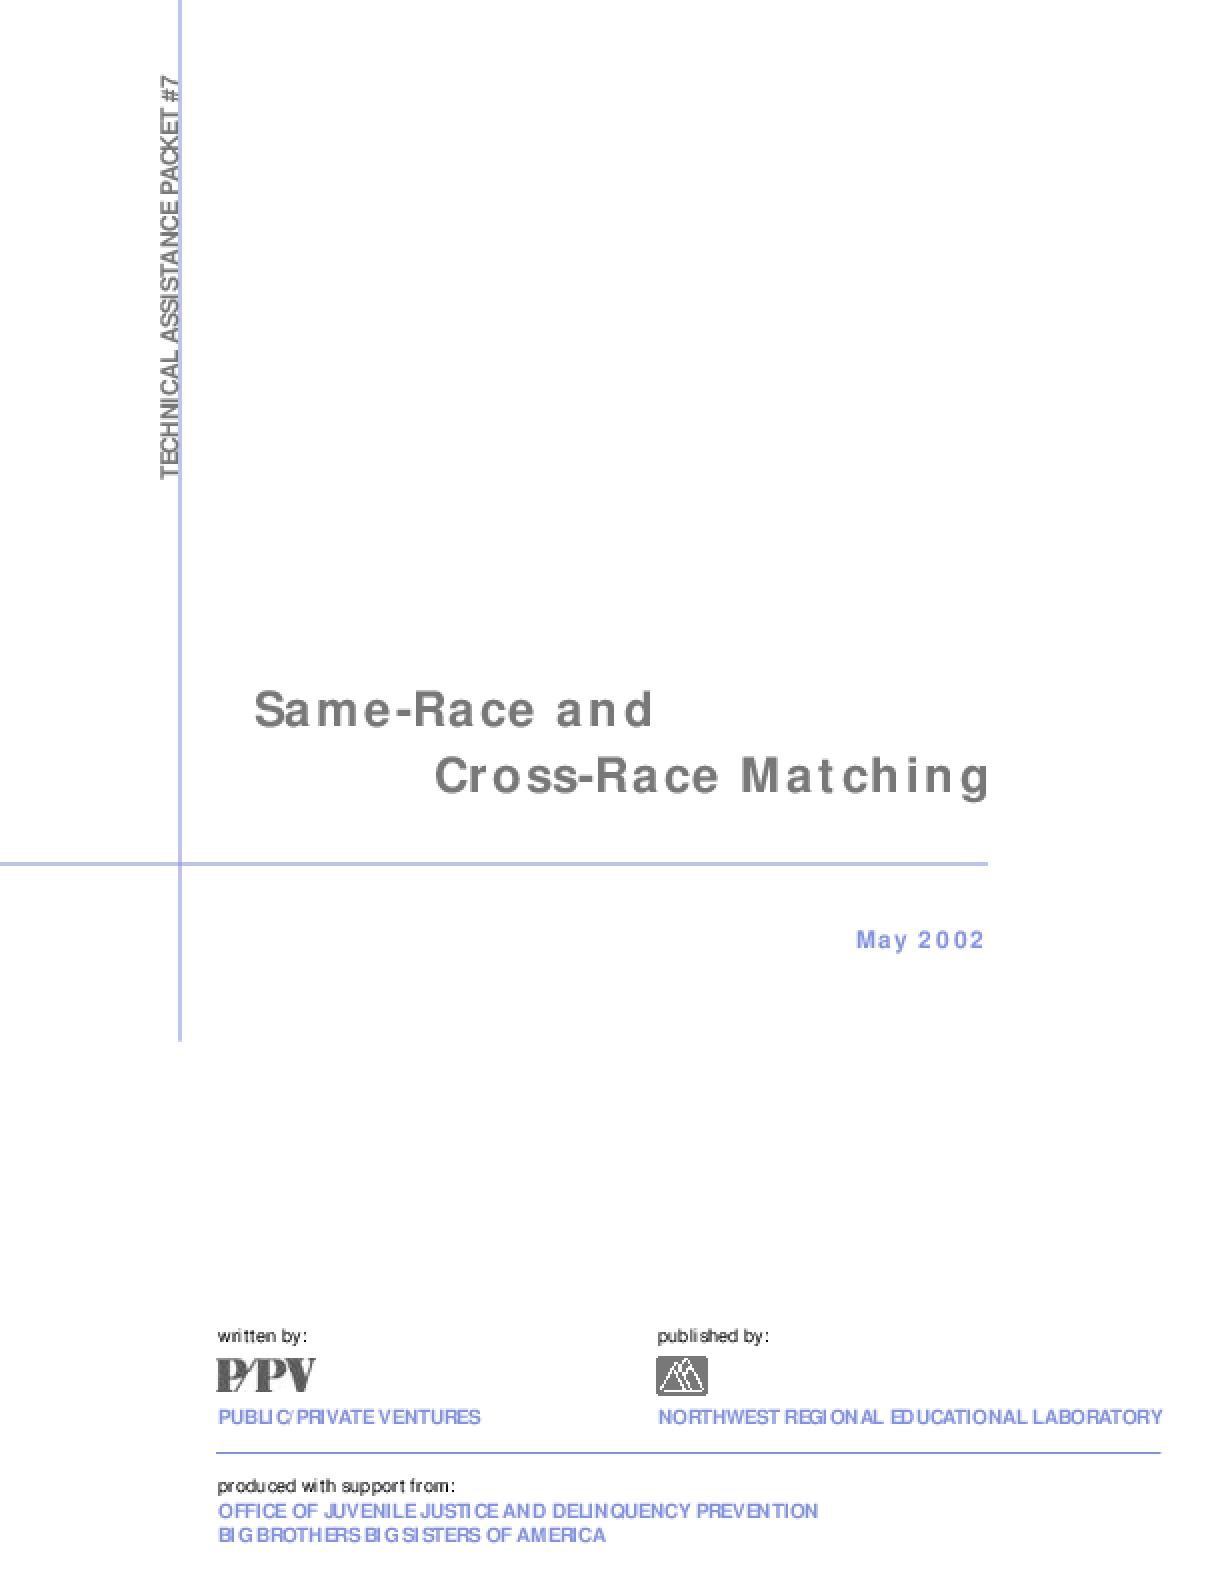 Same Race and Cross Race Matching